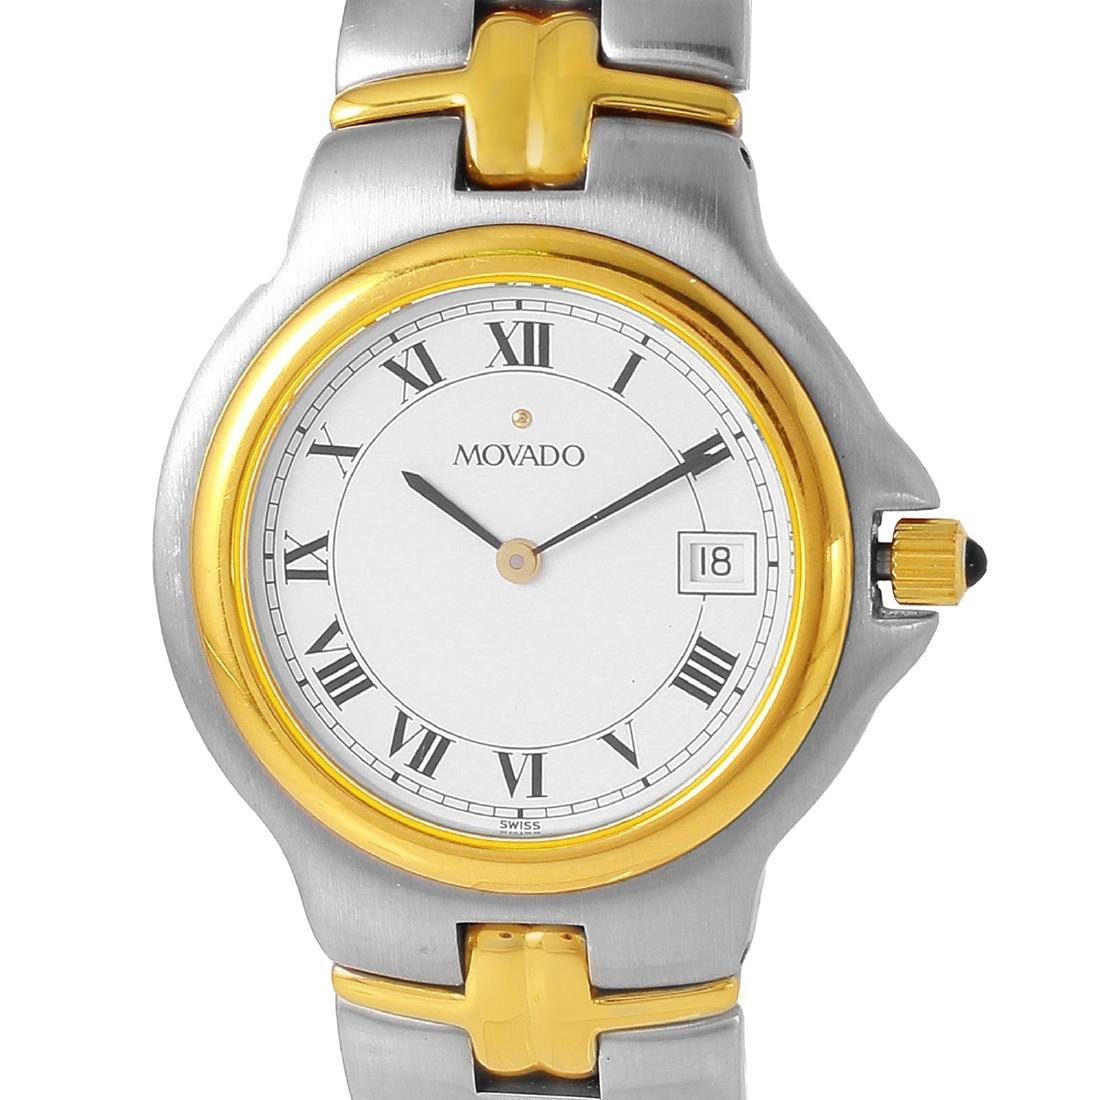 Movado Men's Stainless Steel Quartz Watch